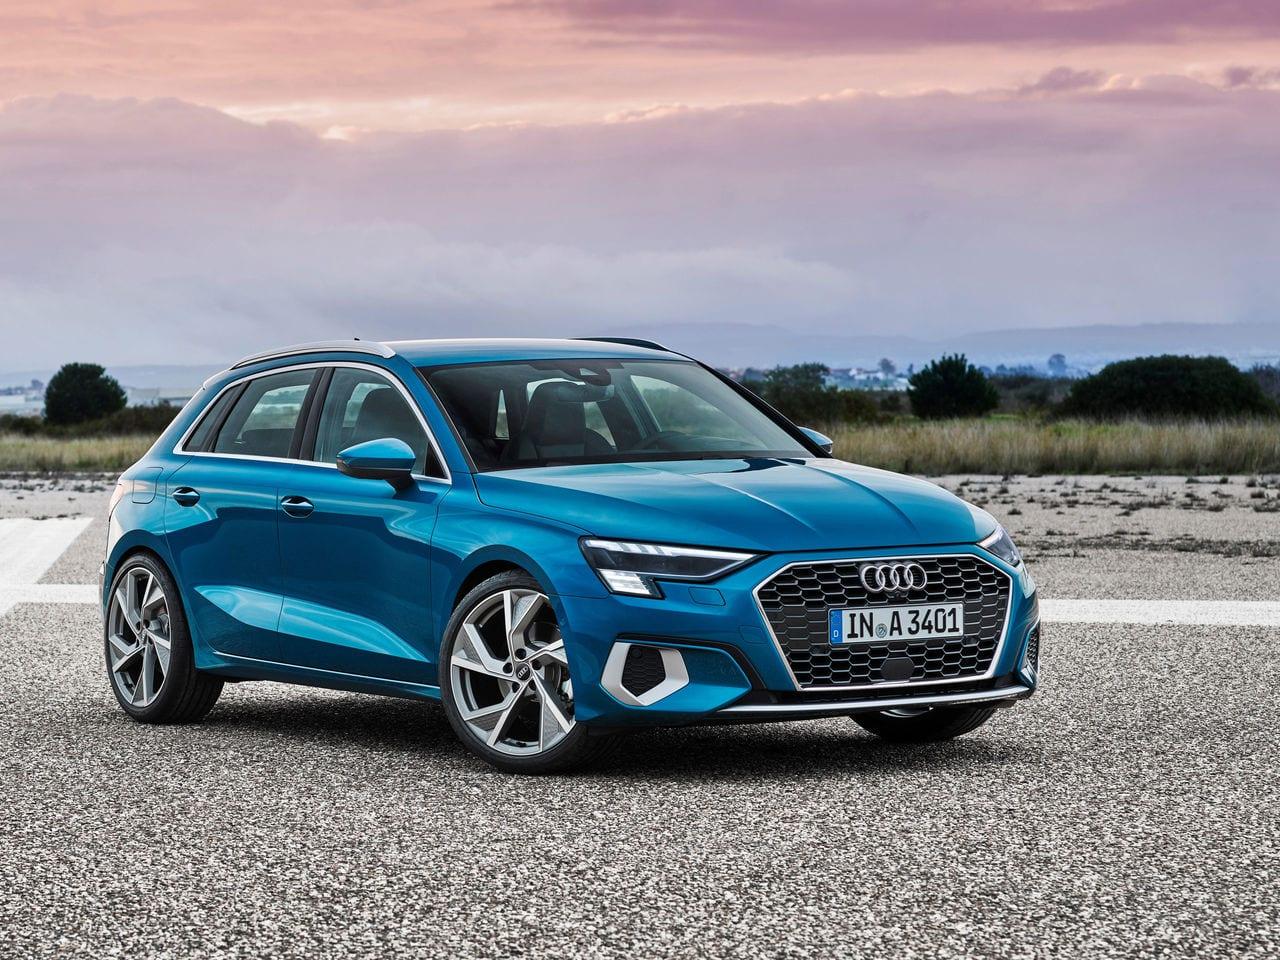 Audi A3 Sportback Driving Test